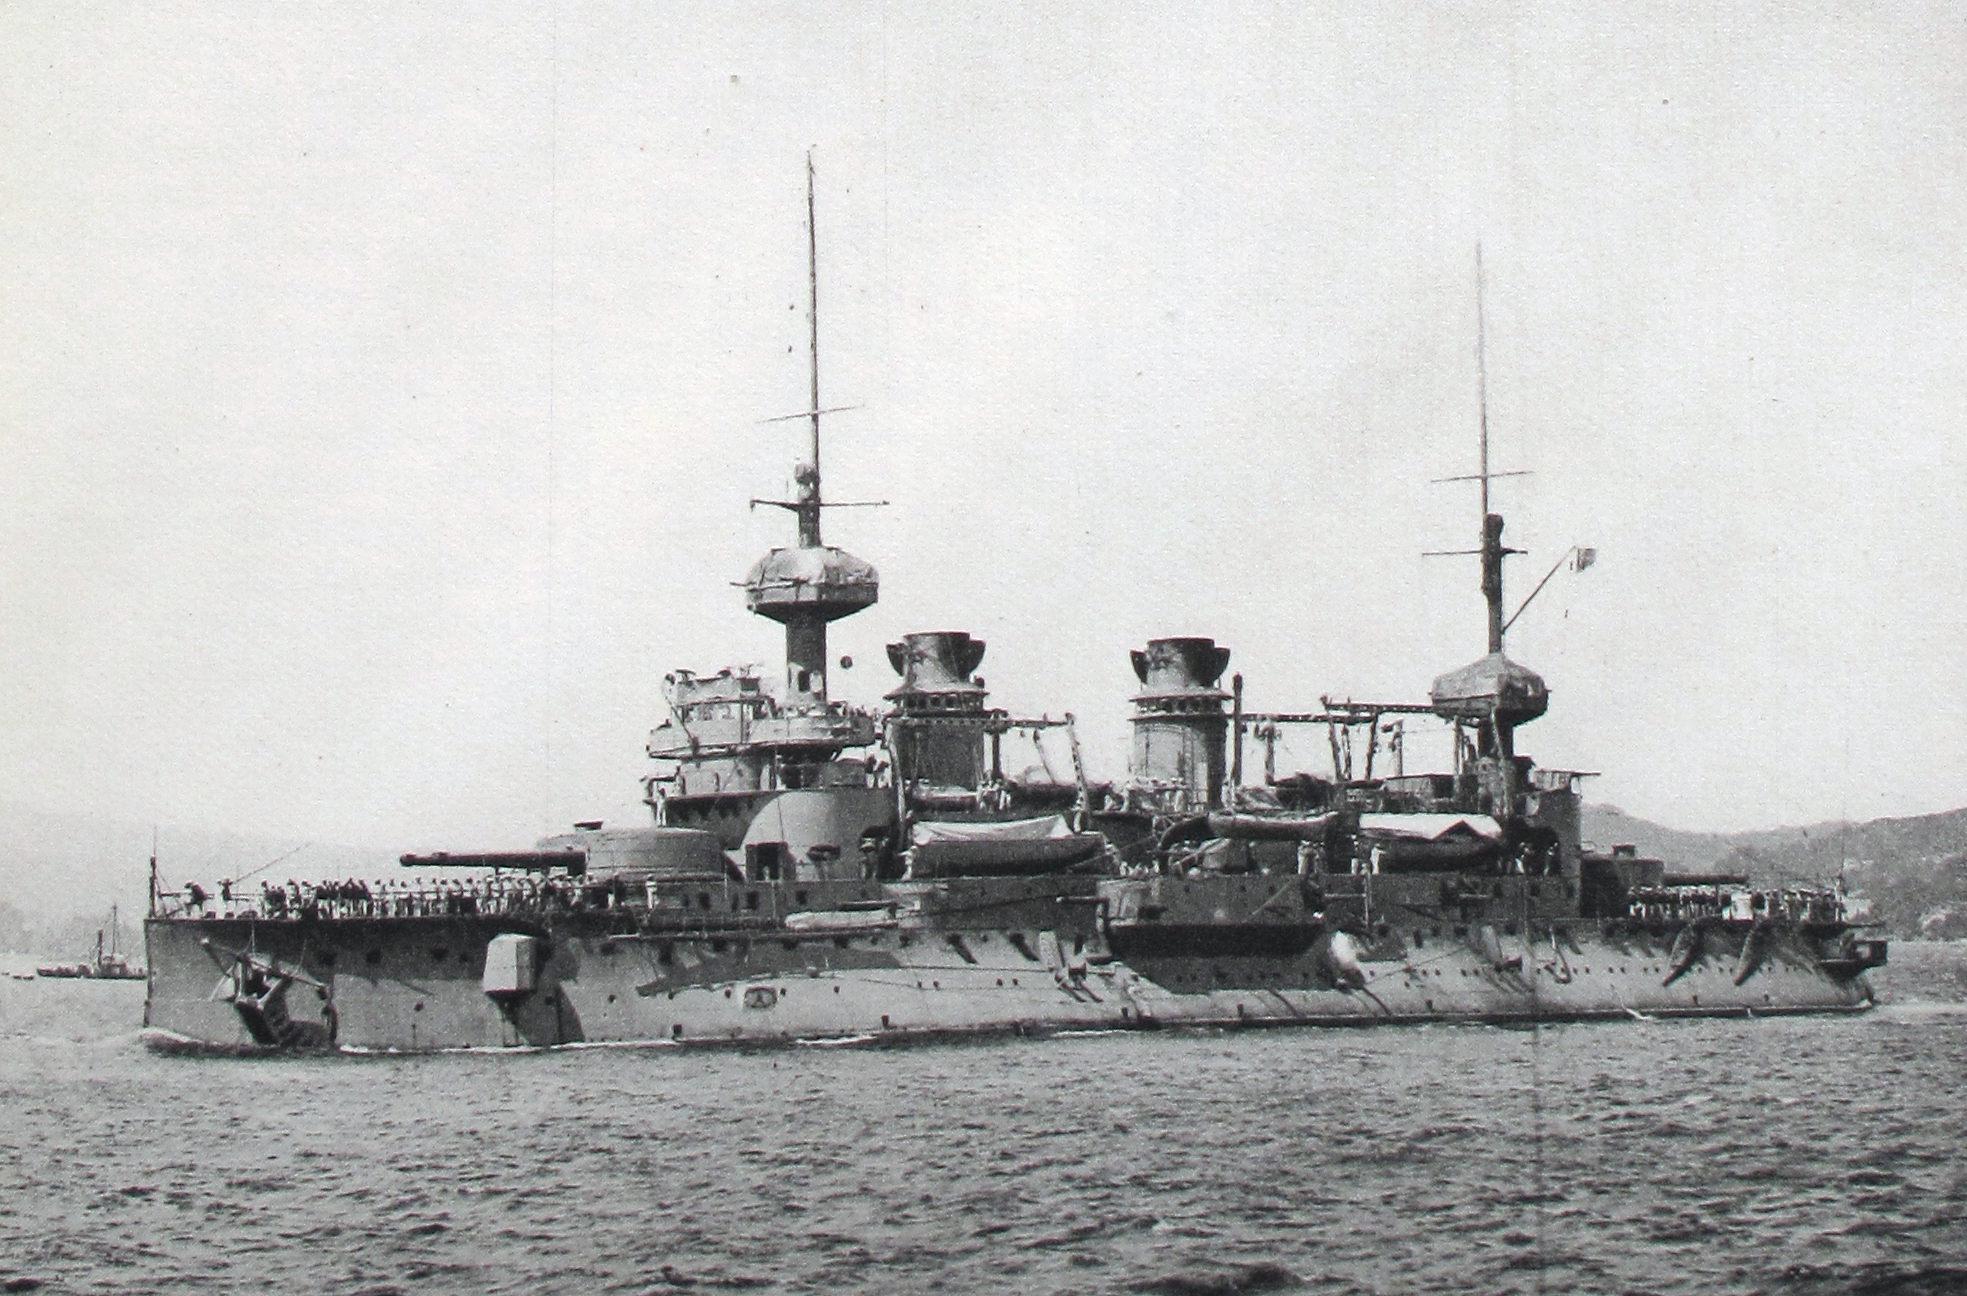 Cuirassé Charlemagne (1915)